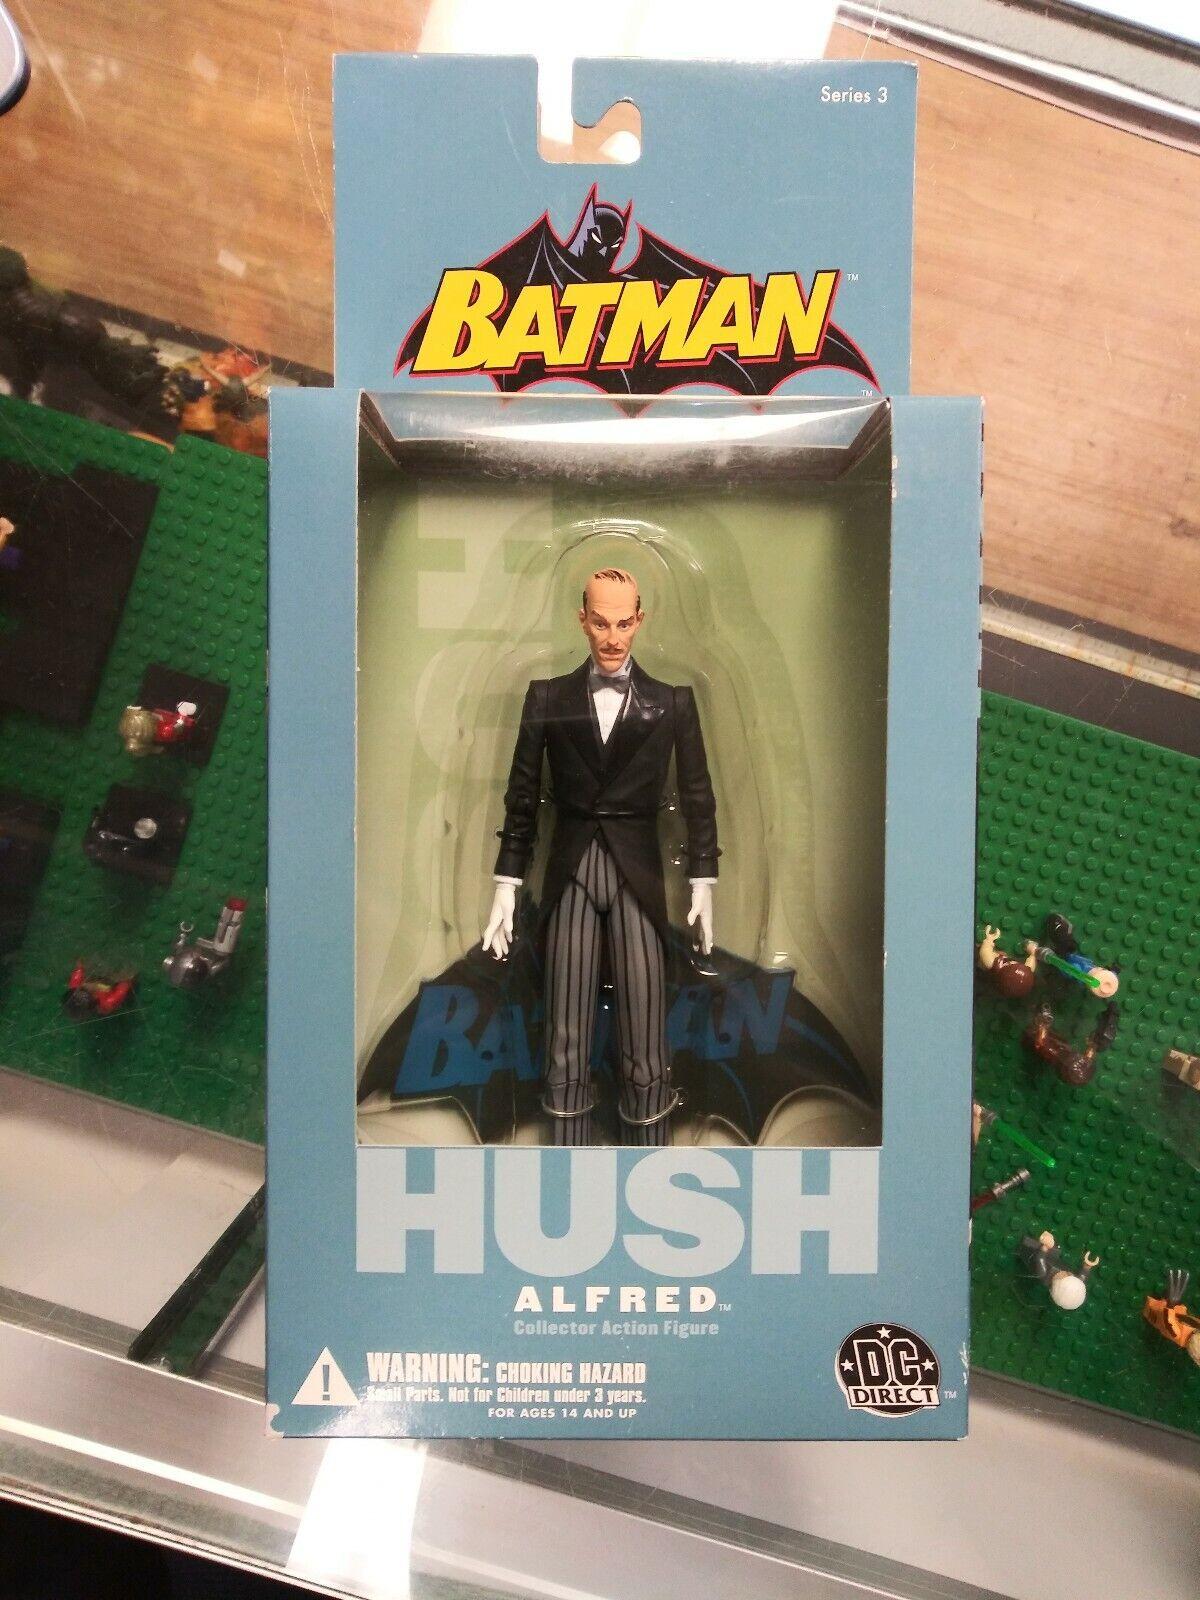 2004 DC Direct Batman Hush ALFRED Series 3 Action Figure MOC